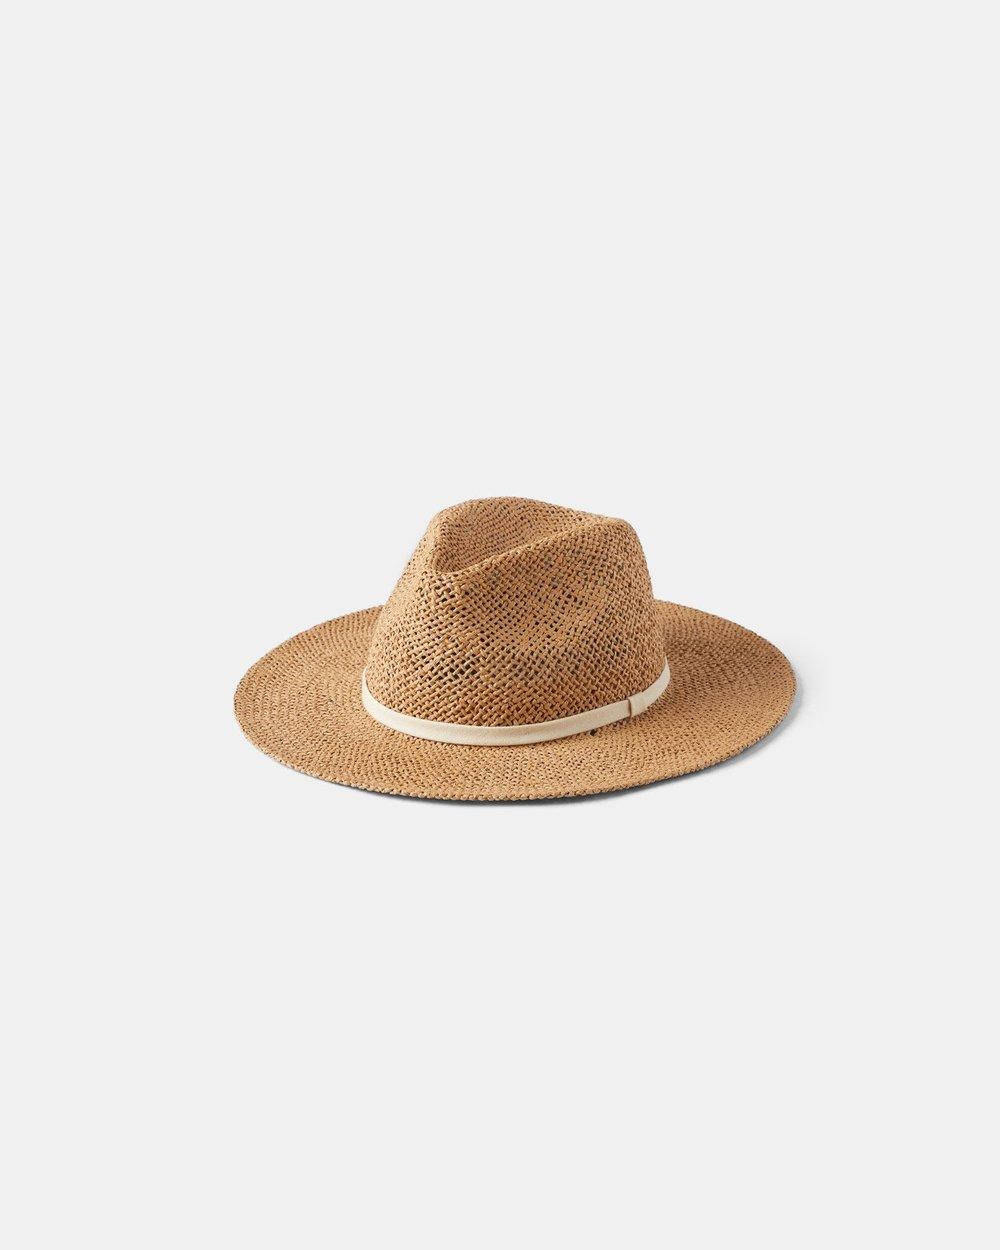 will-and-bear-yorke-sand-straw-hat-1.jpg